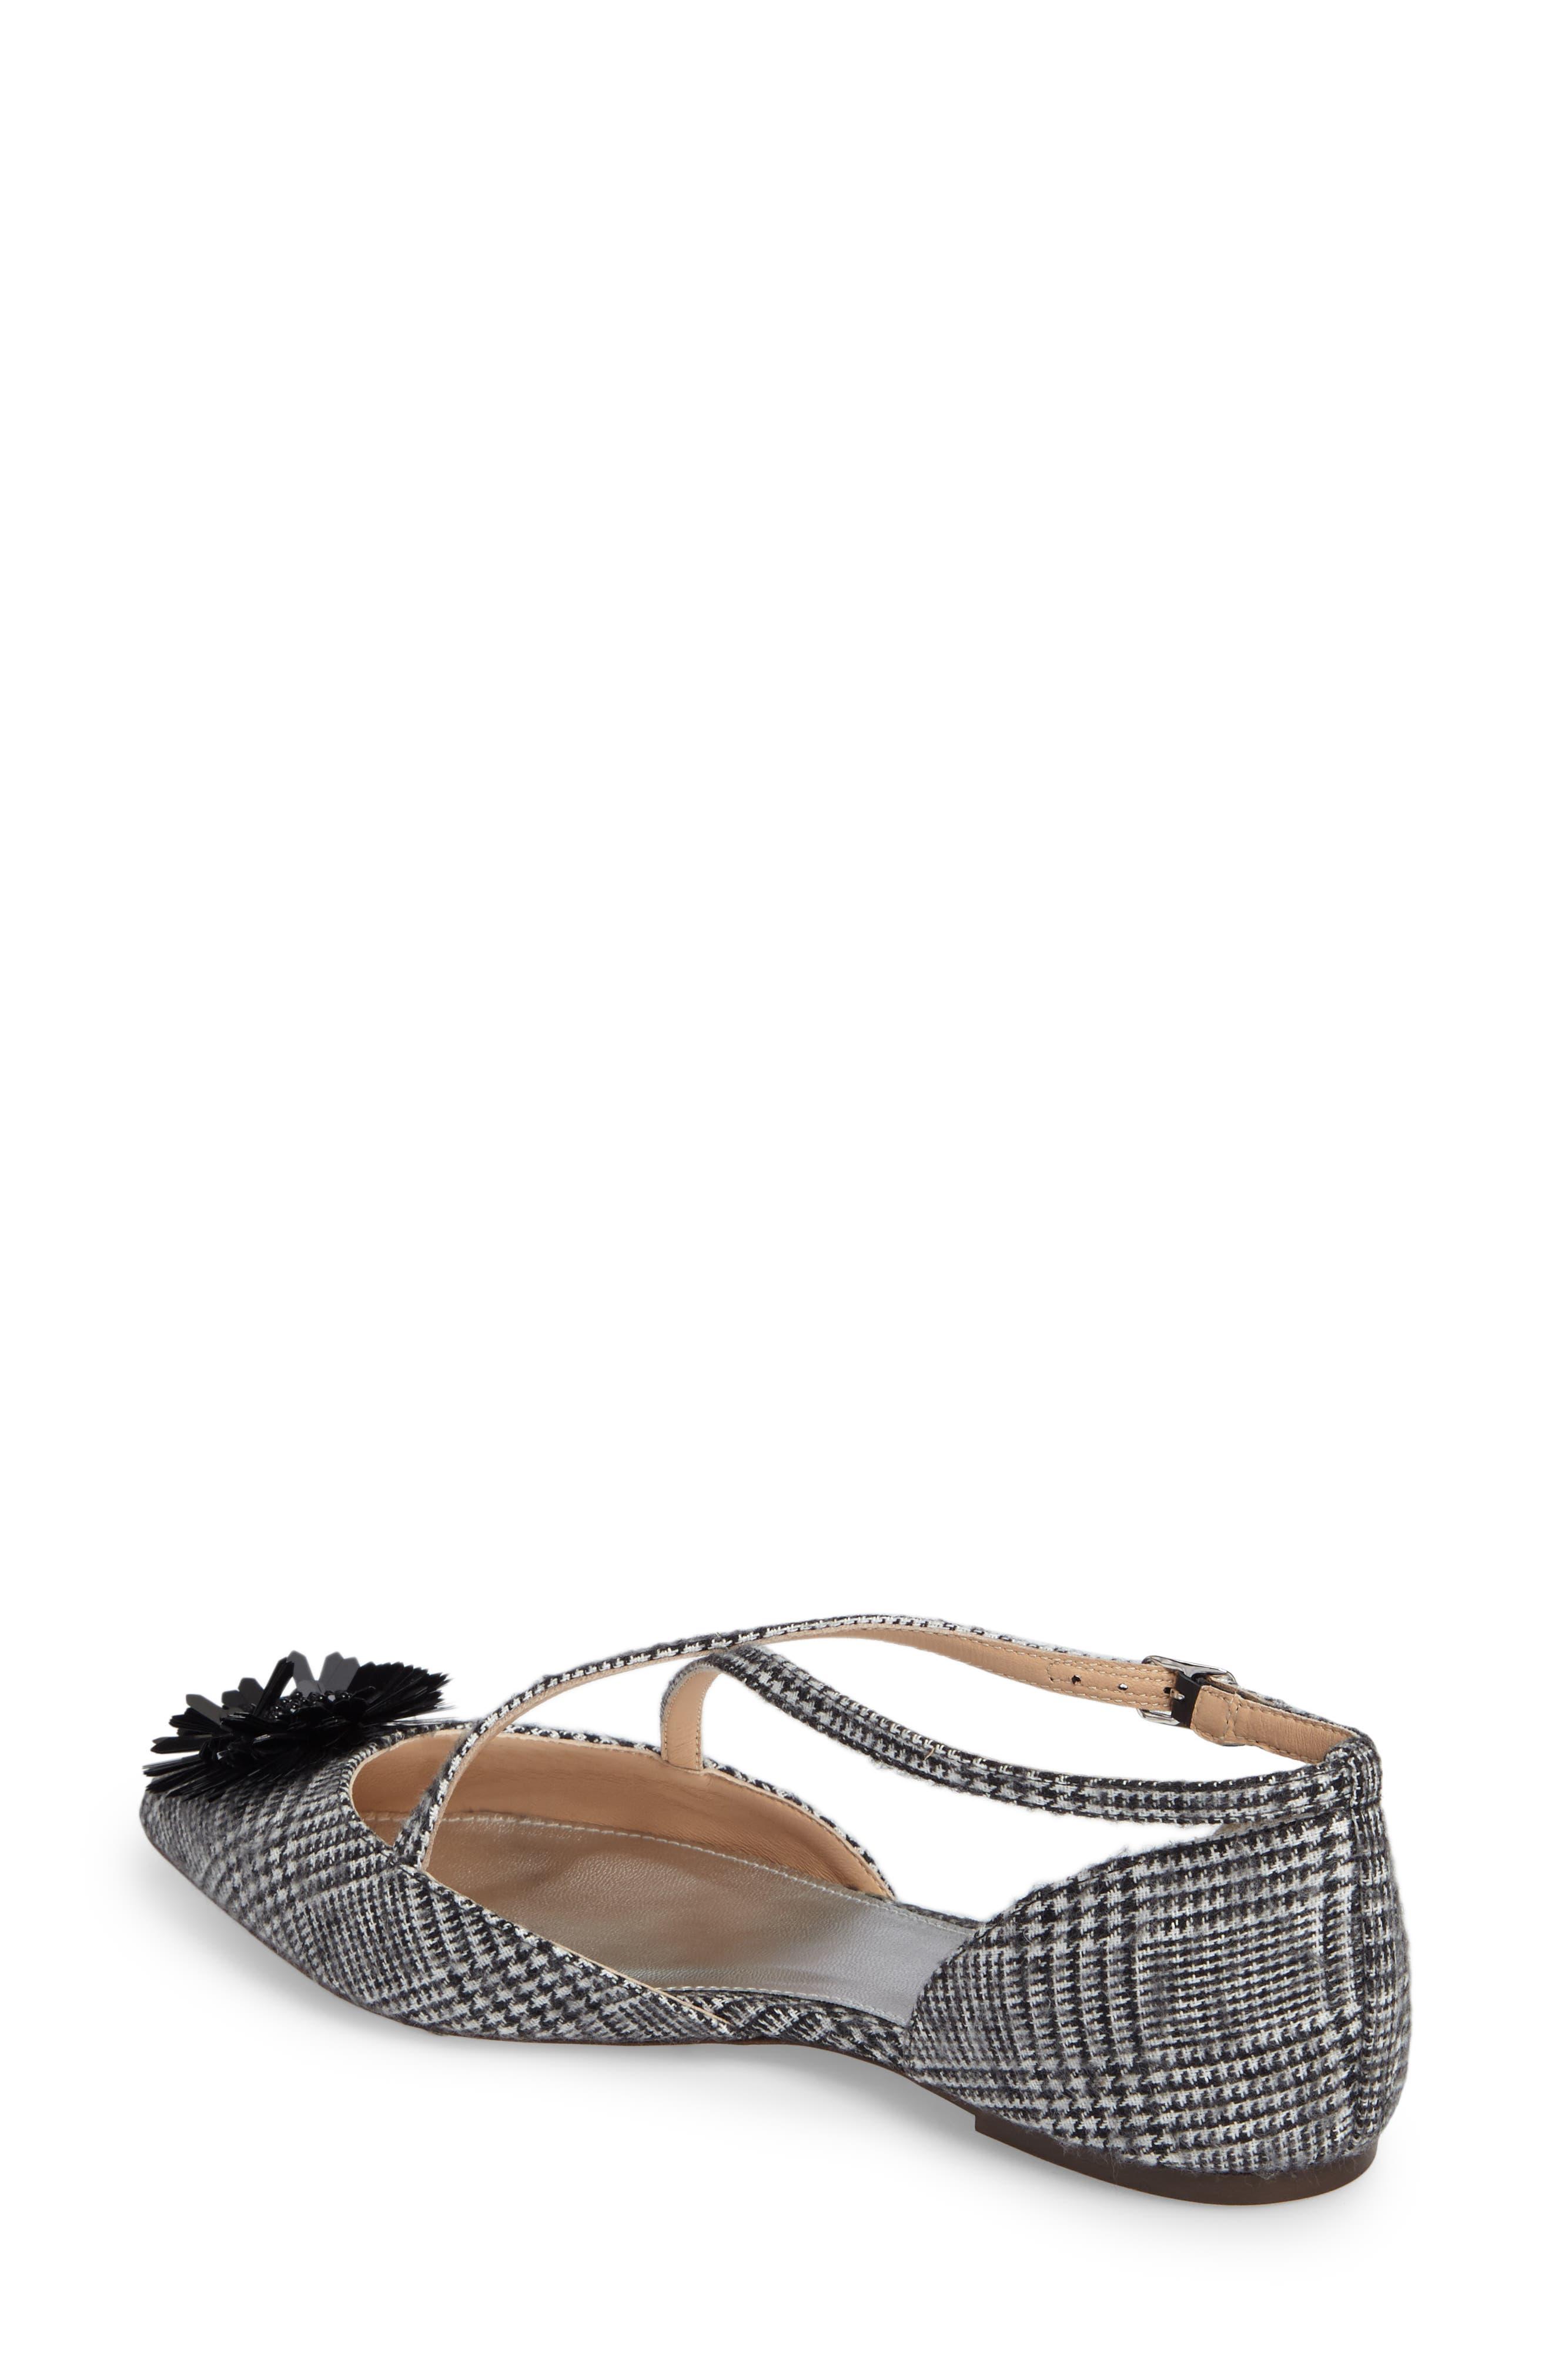 Sadie Cross Strap Pointy Toe Flat,                             Alternate thumbnail 2, color,                             Black/ White Fabric